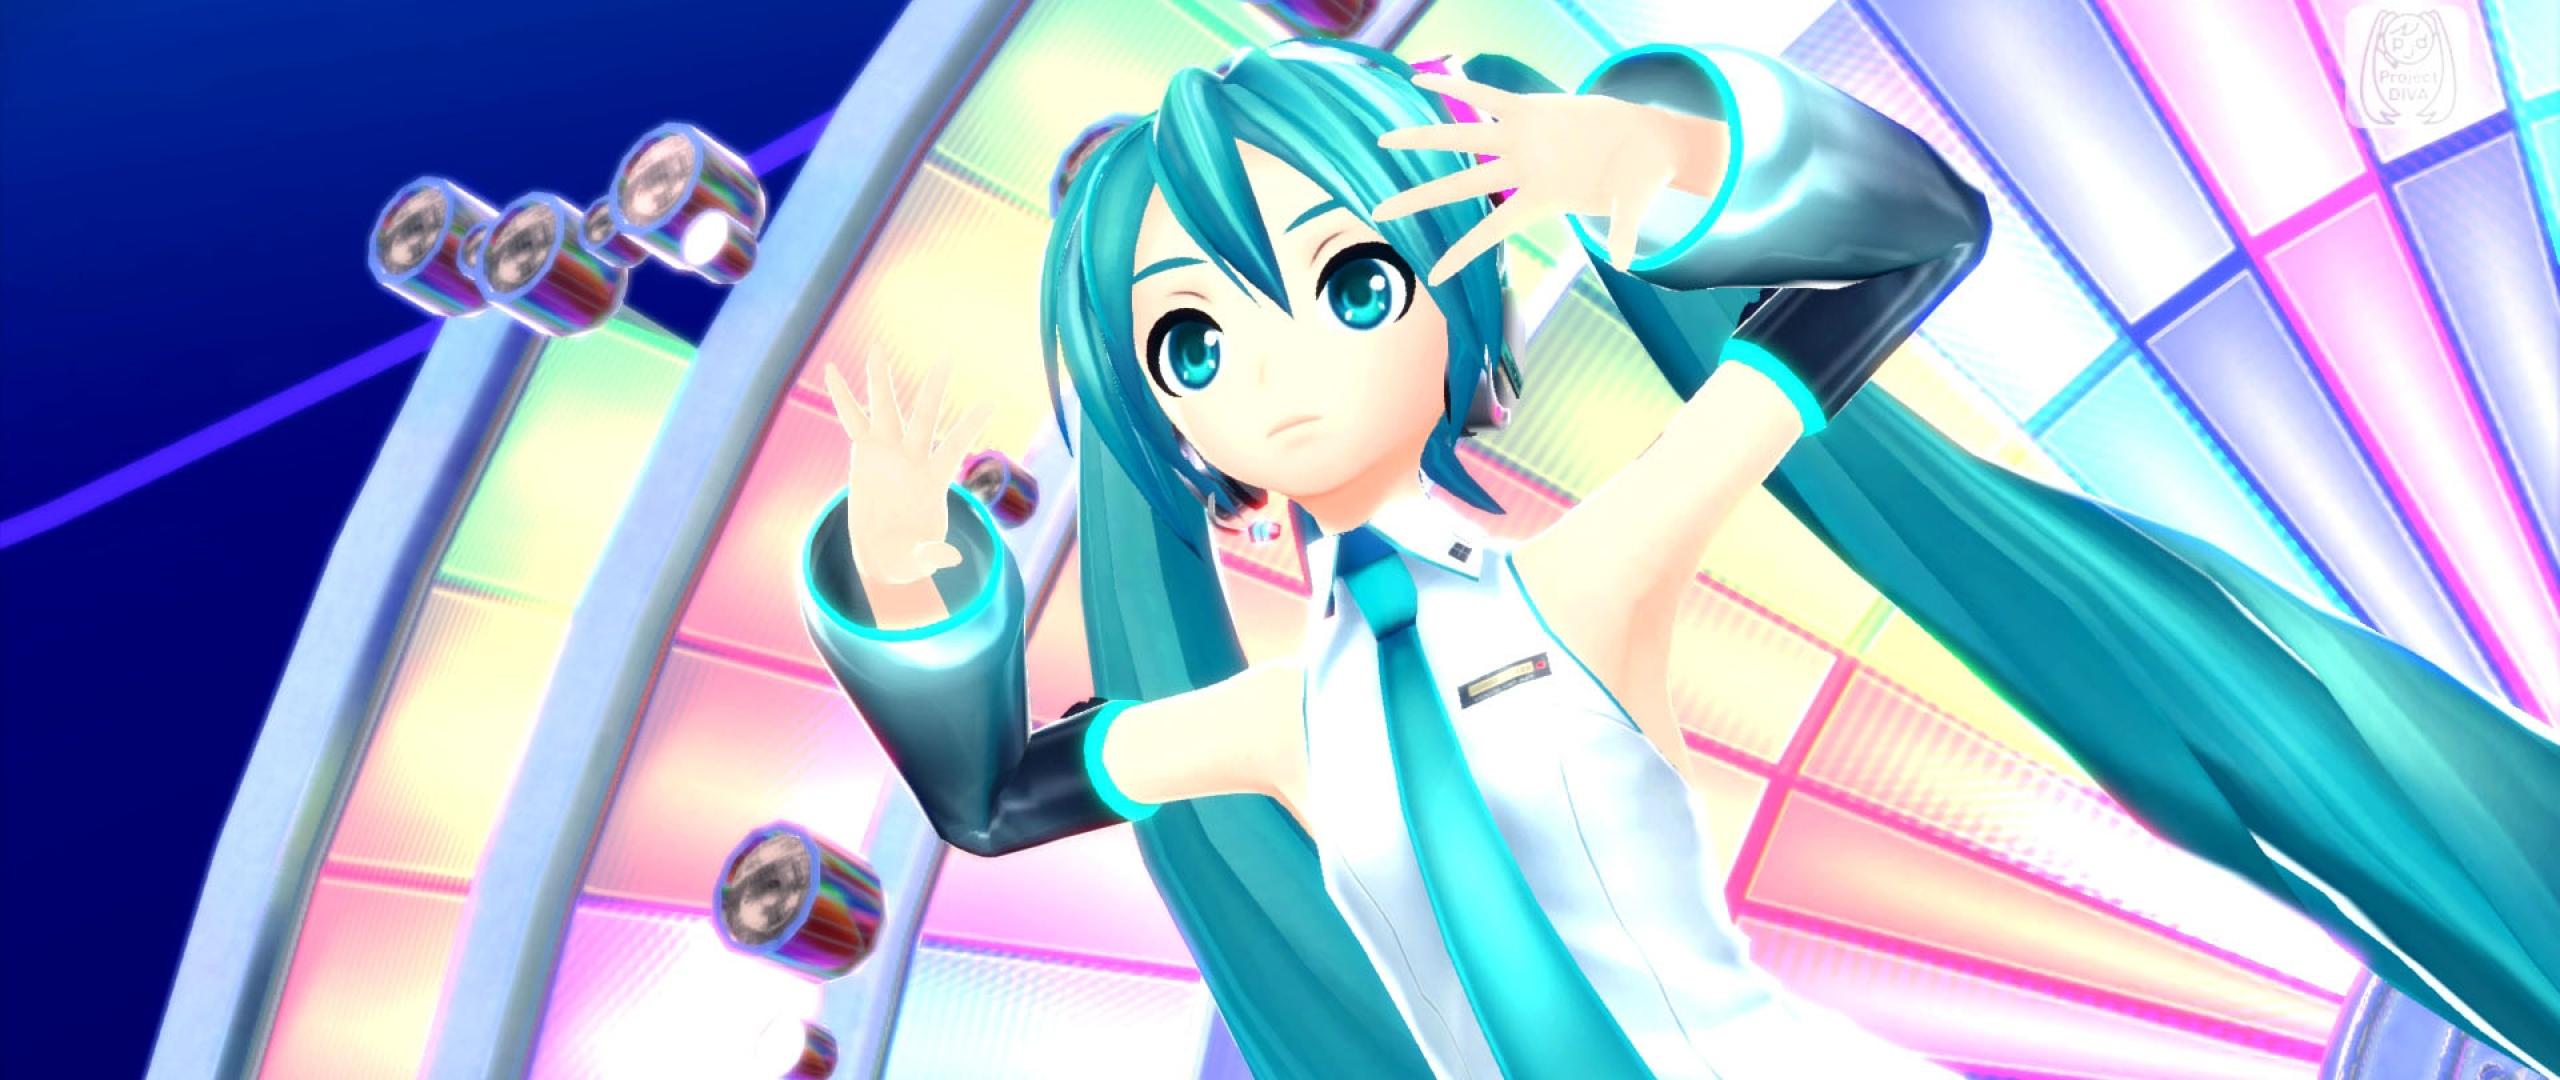 Download Wallpaper 2560x1080 hatsune miku project diva f 2nd hatsune 2560x1080